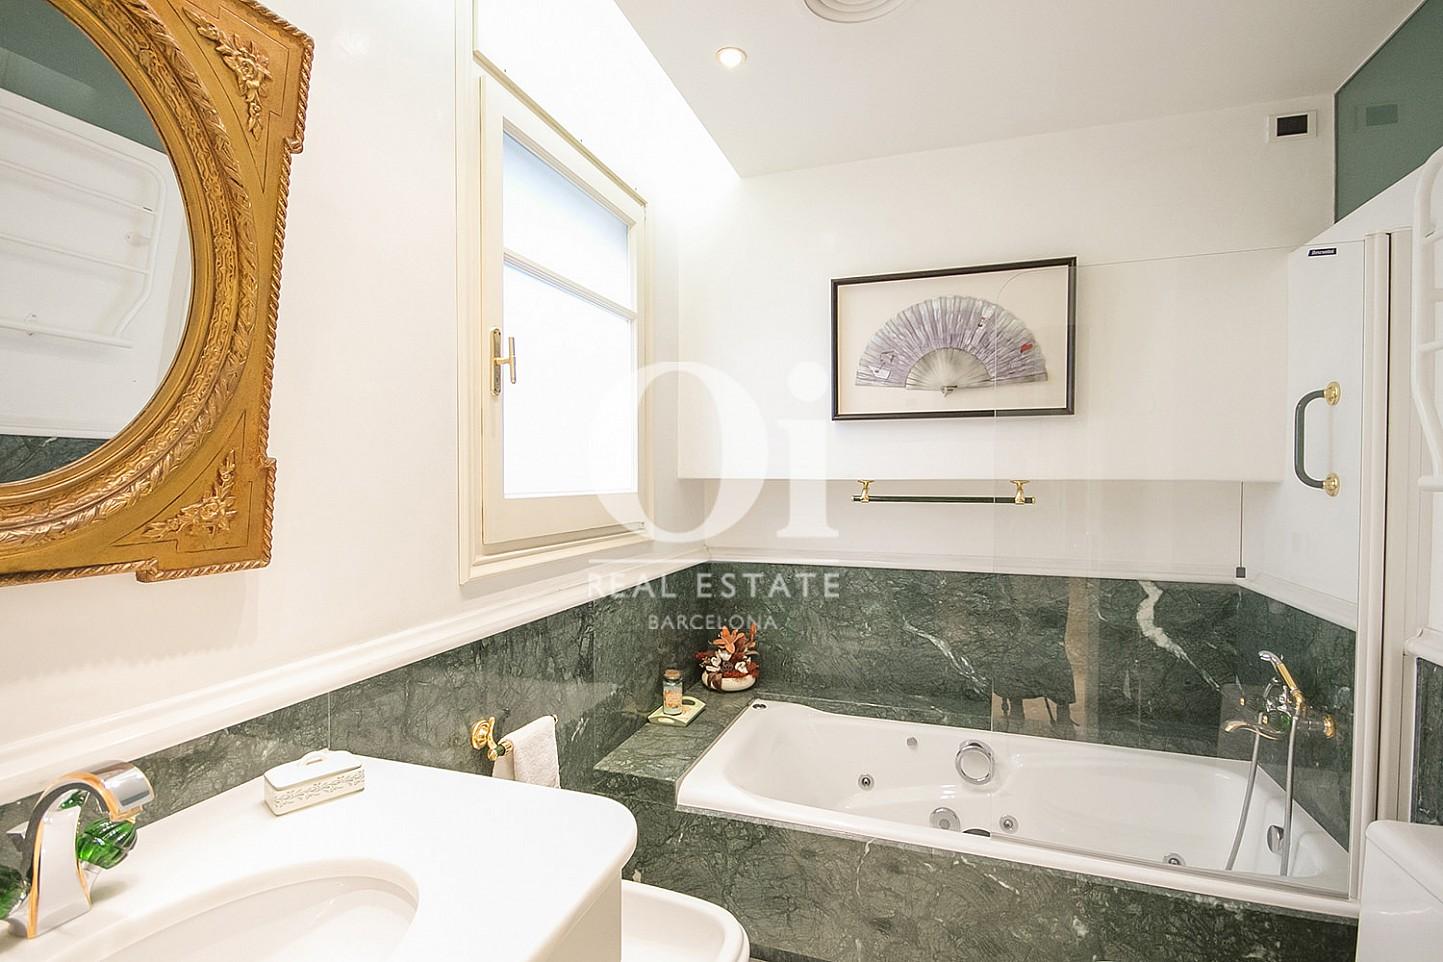 Badezimmer in Luxus-Immobilie zum Kauf in la Bonanova in Barcelona